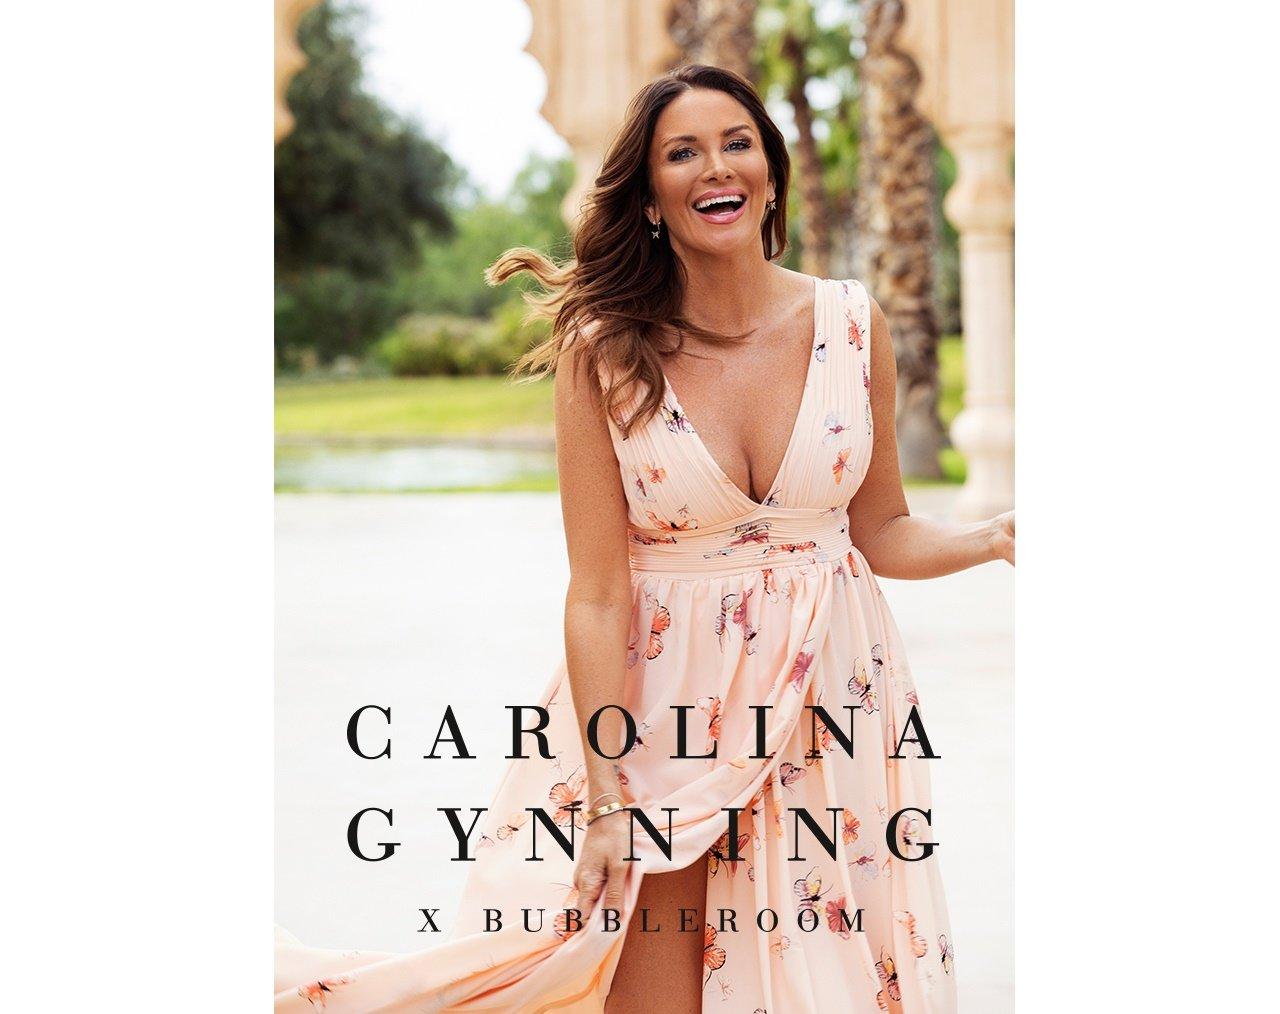 Carolina Gynning Design Collab with Bubbleroom